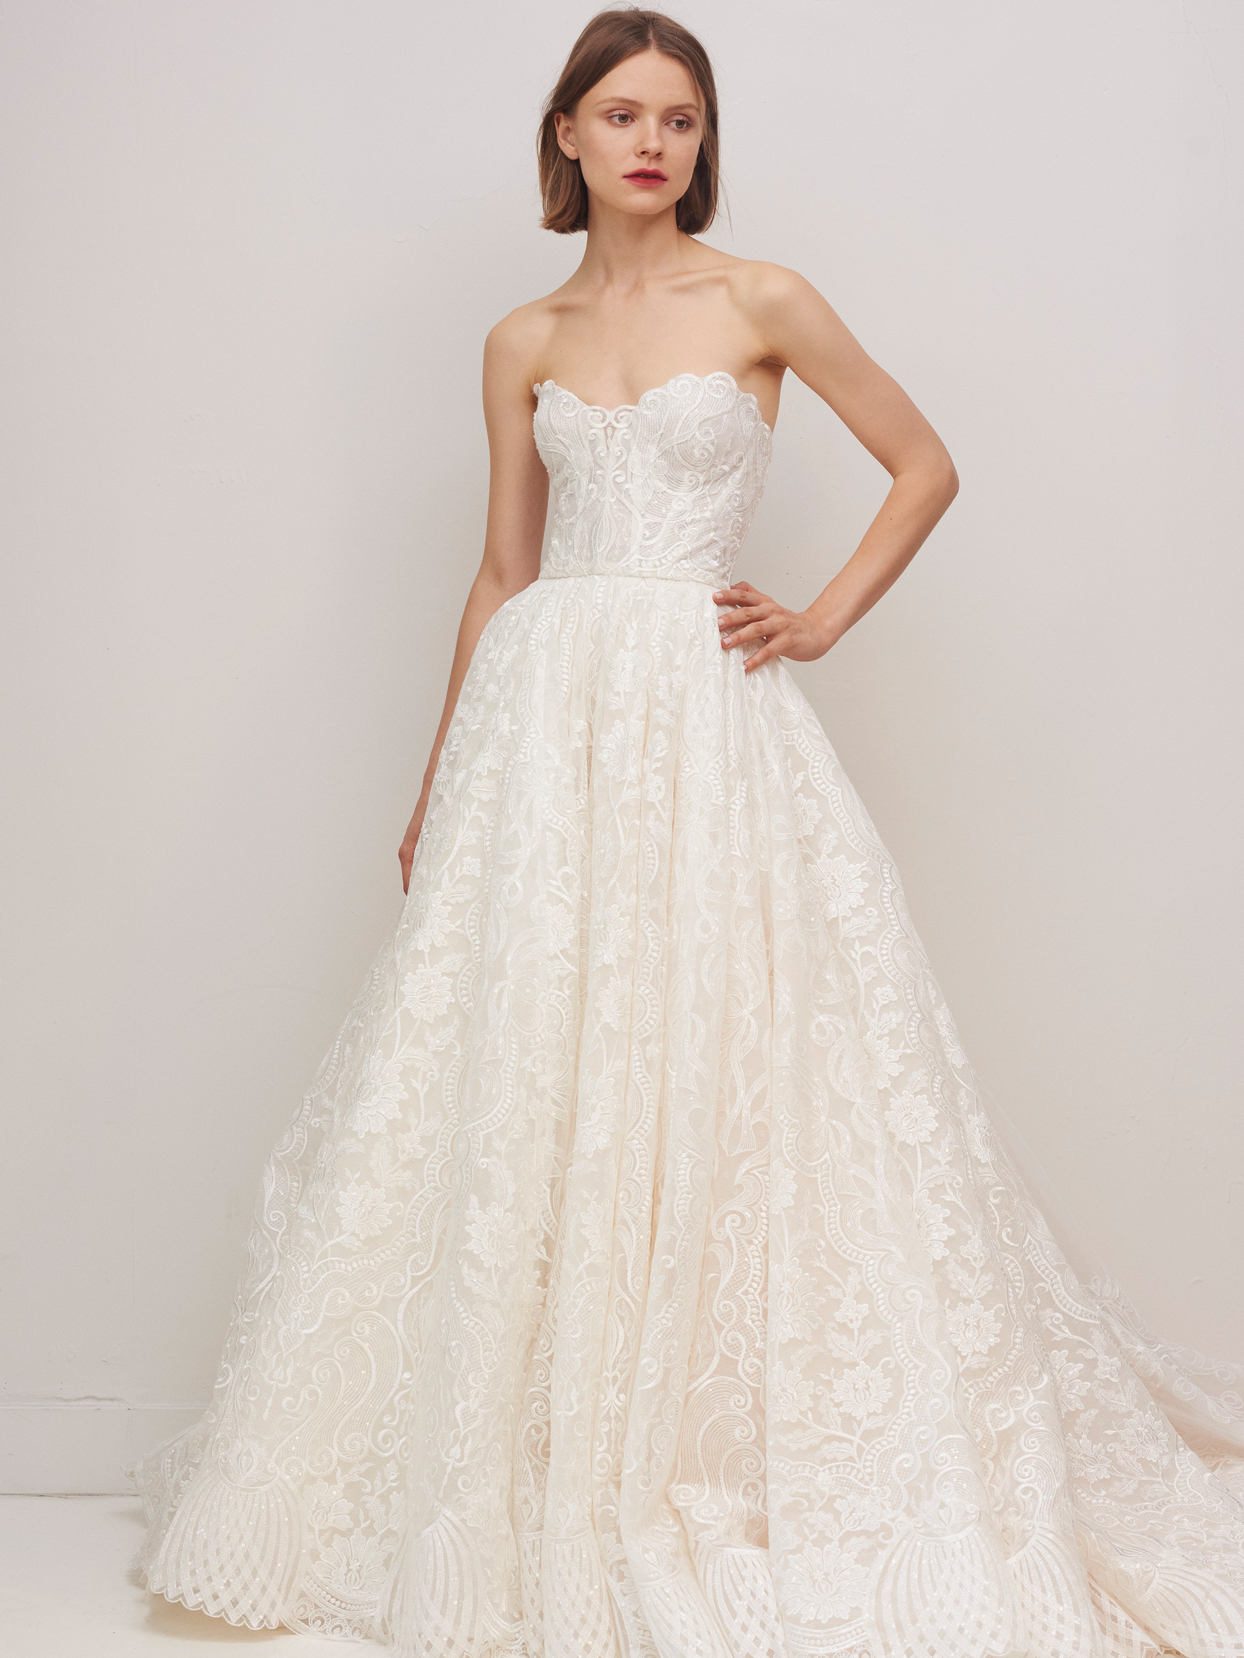 rivini by rita vinieris lace strapless a-line wedding dress fall 2020